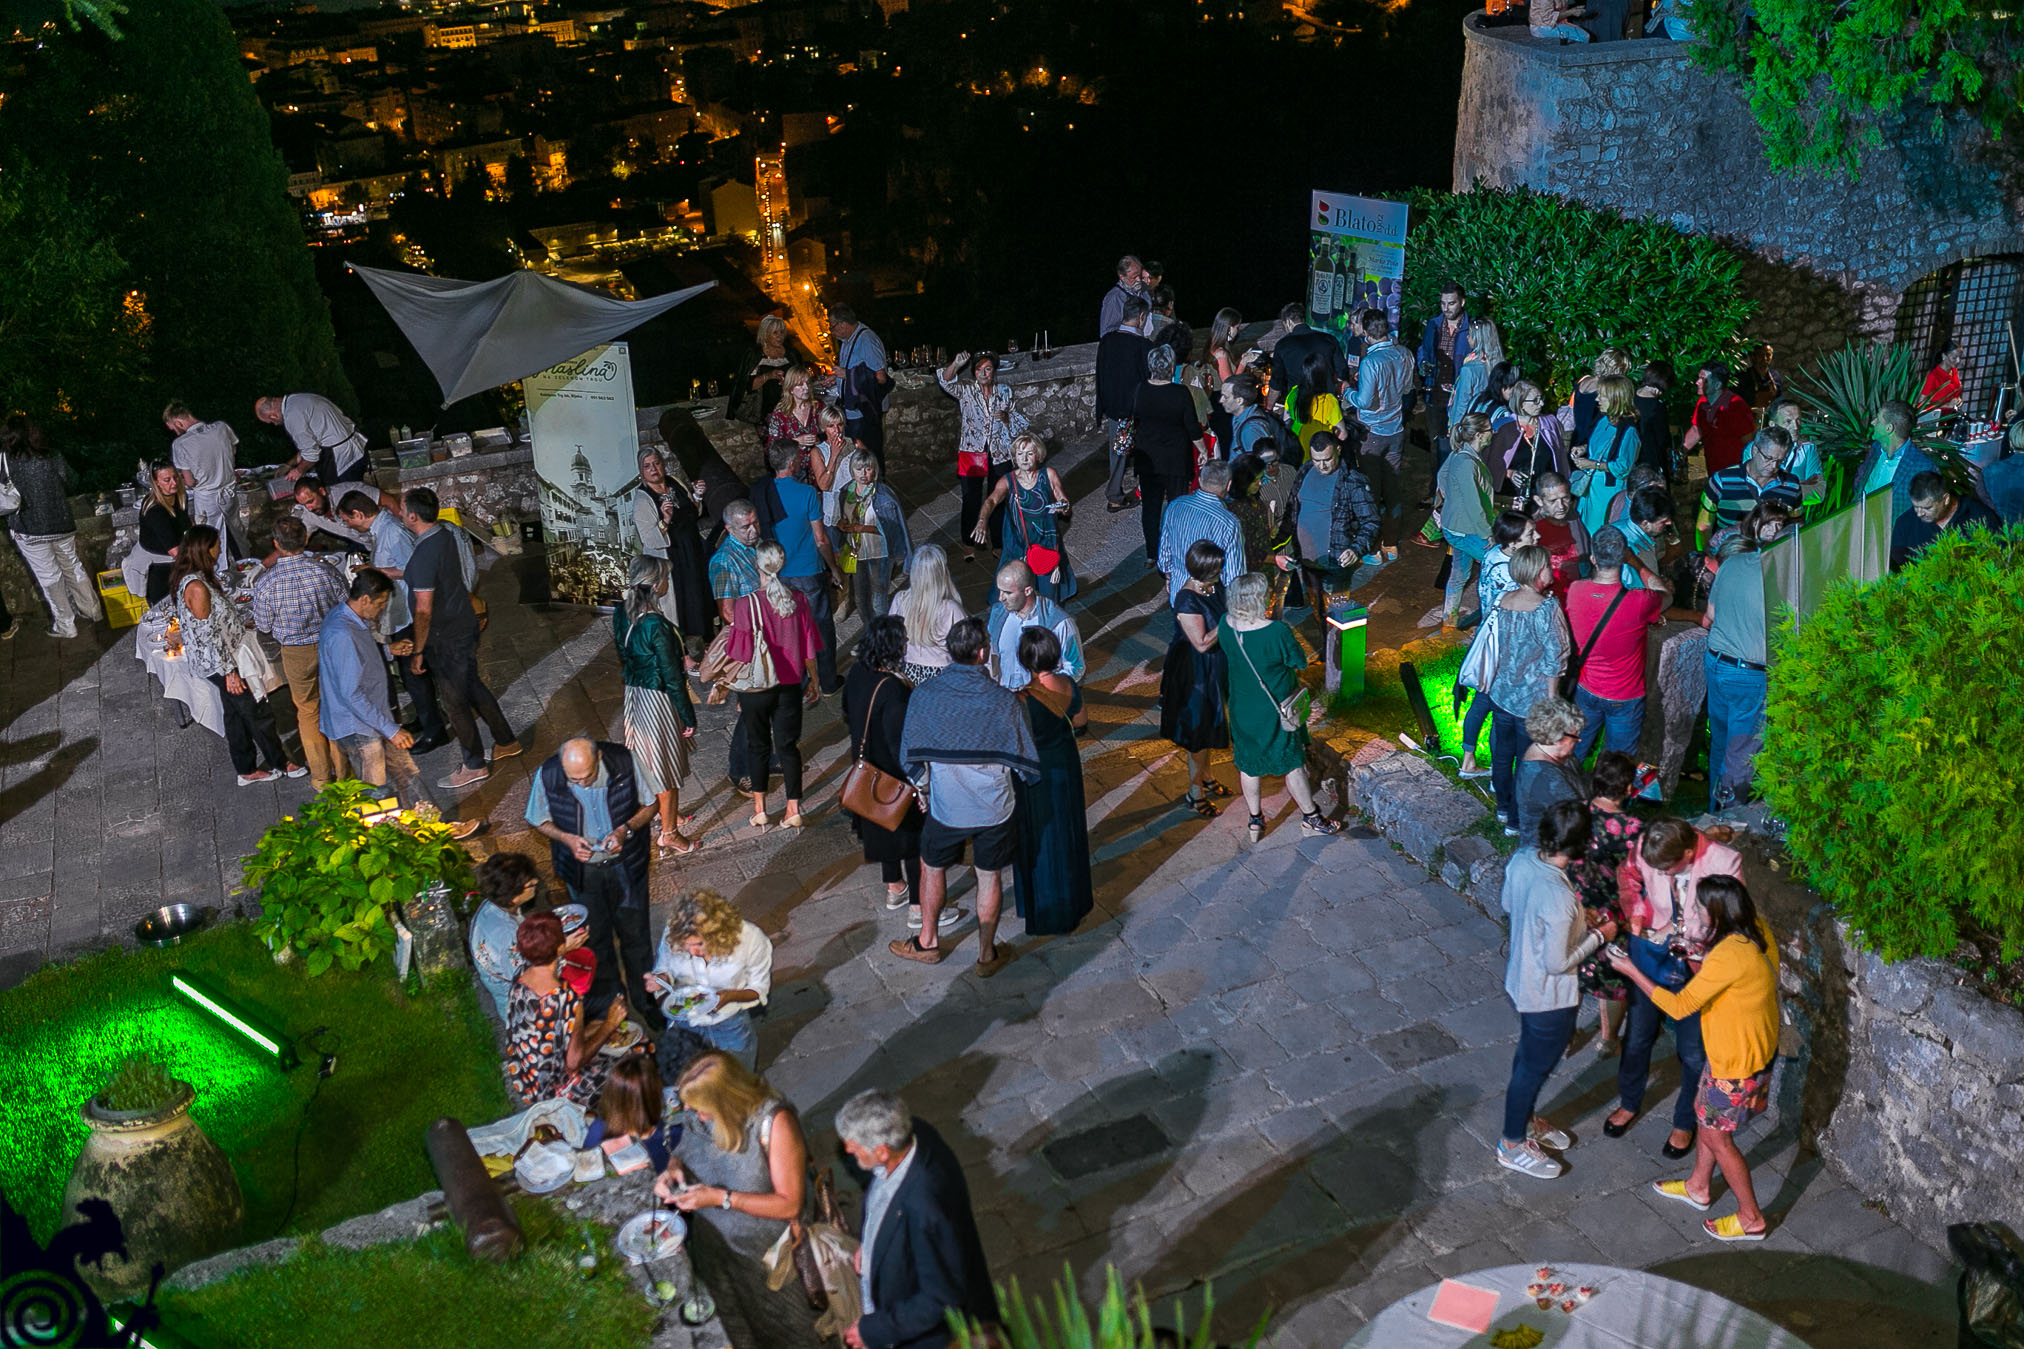 Goran Karan I Gastronomske Delicije Privukli Brojne Posjetitelje Na Trsatsku Gradinu